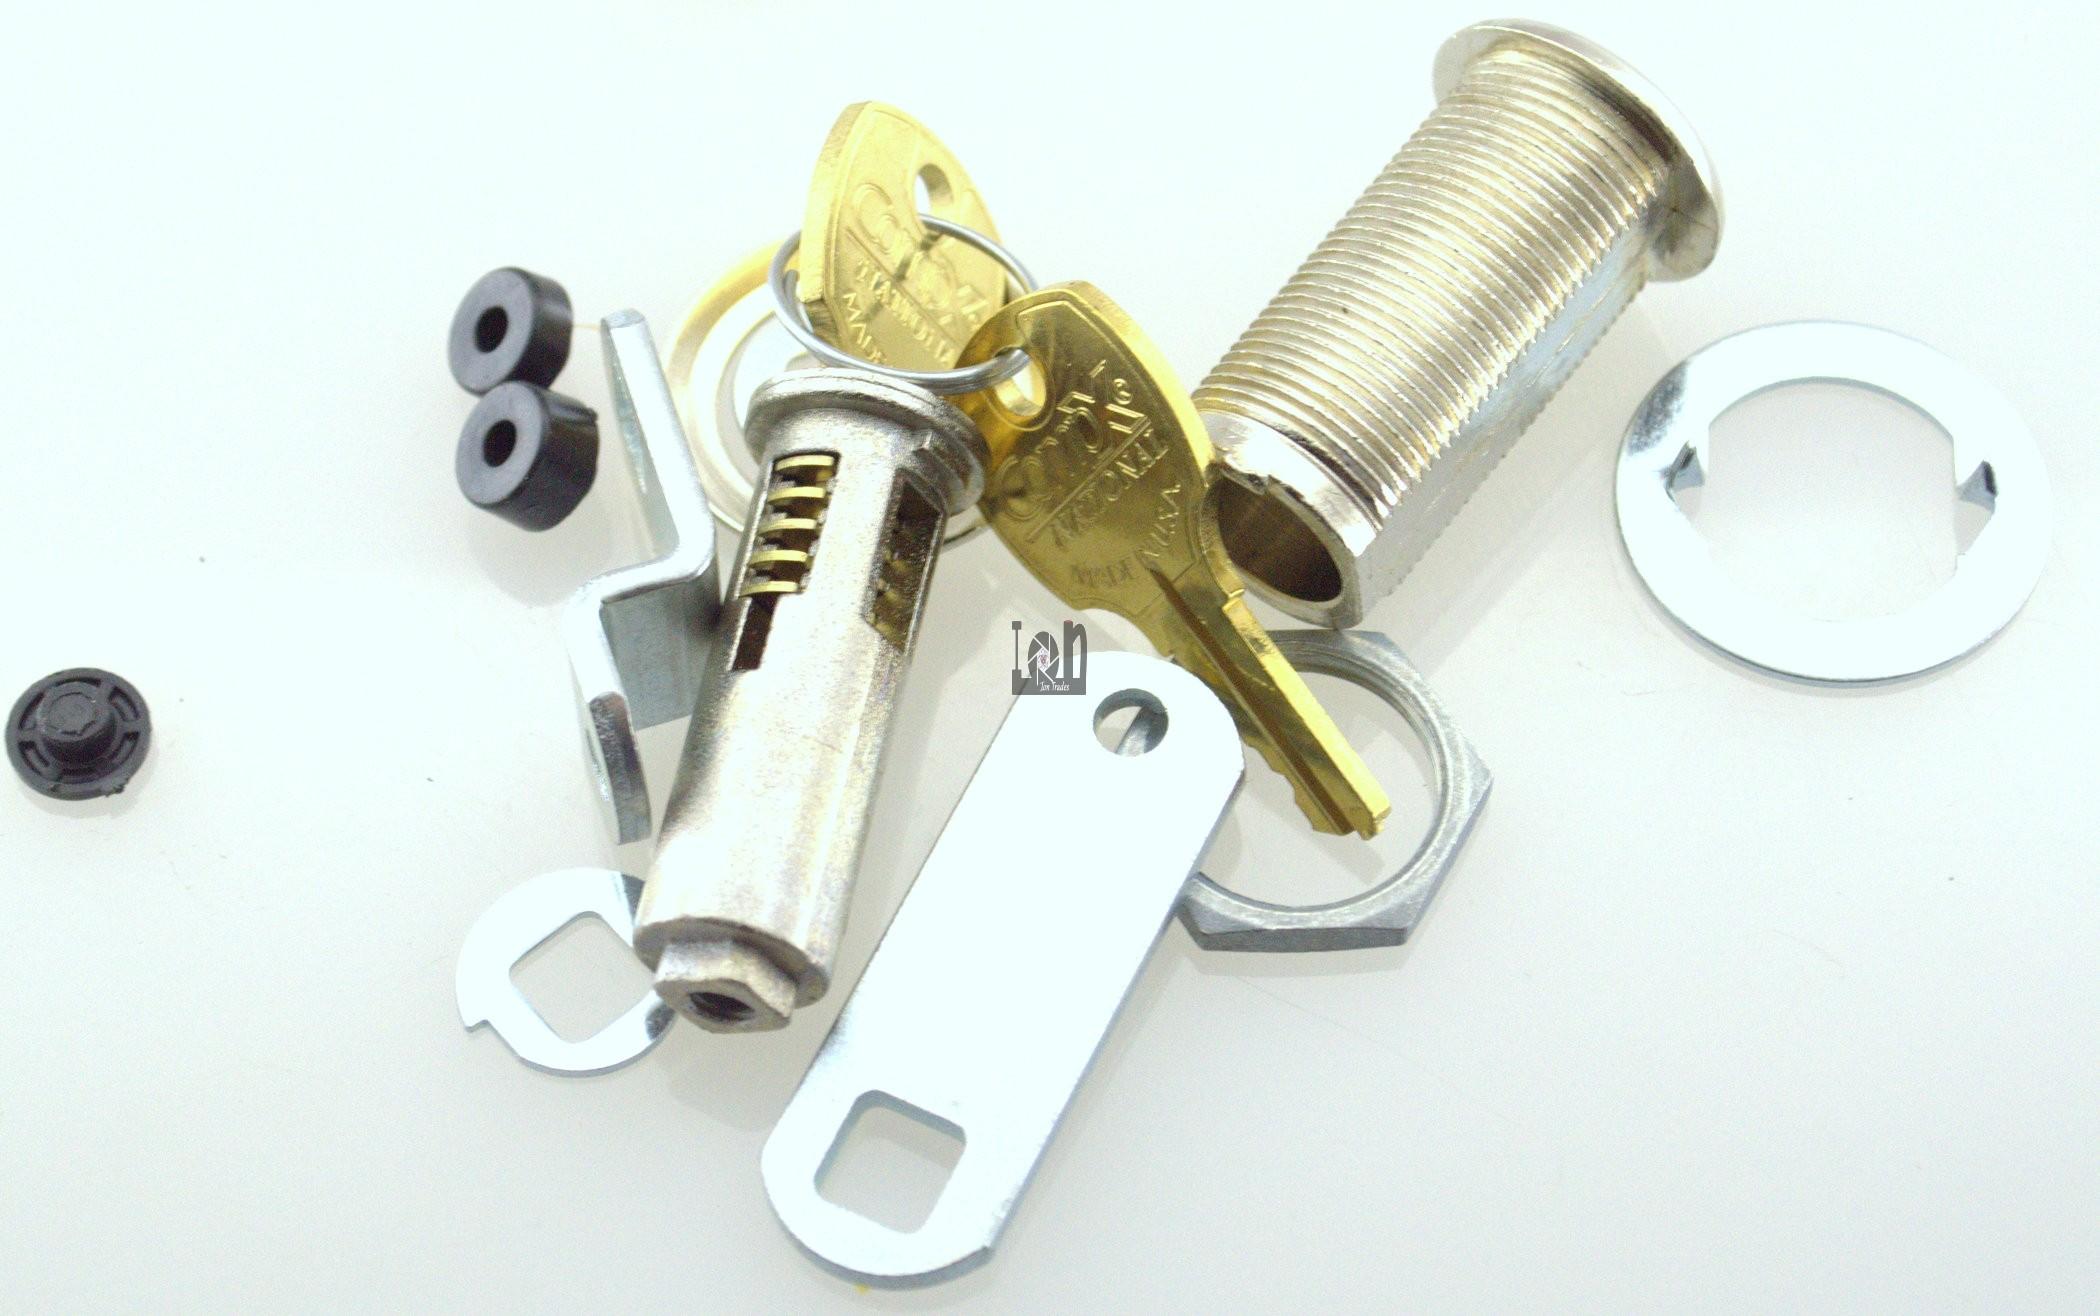 Compz Cam Lock C8075-C415A-14A Locksmith Supplies